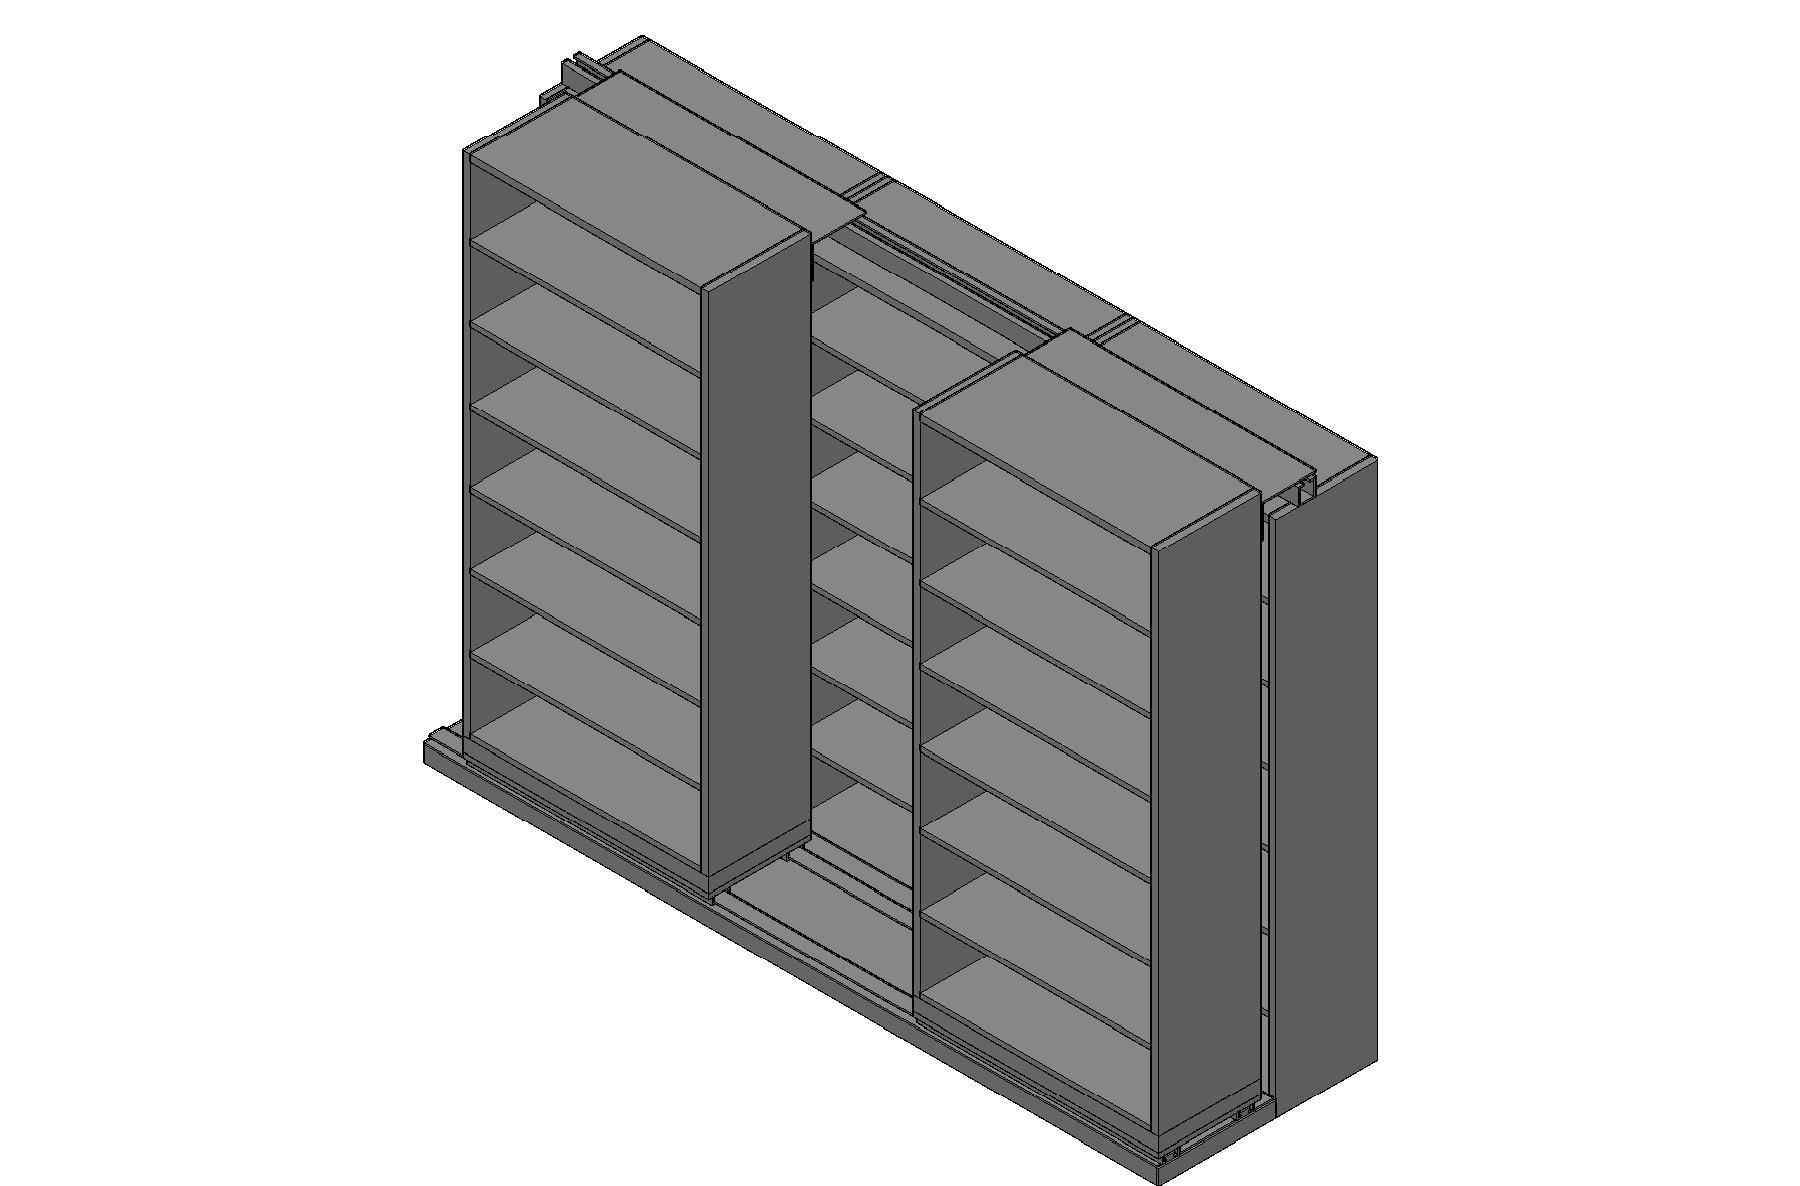 "Legal Size Sliding Shelves - 2 Rows Deep - 7 Levels - (36"" x 15"" Shelves) - 112"" Total Width"